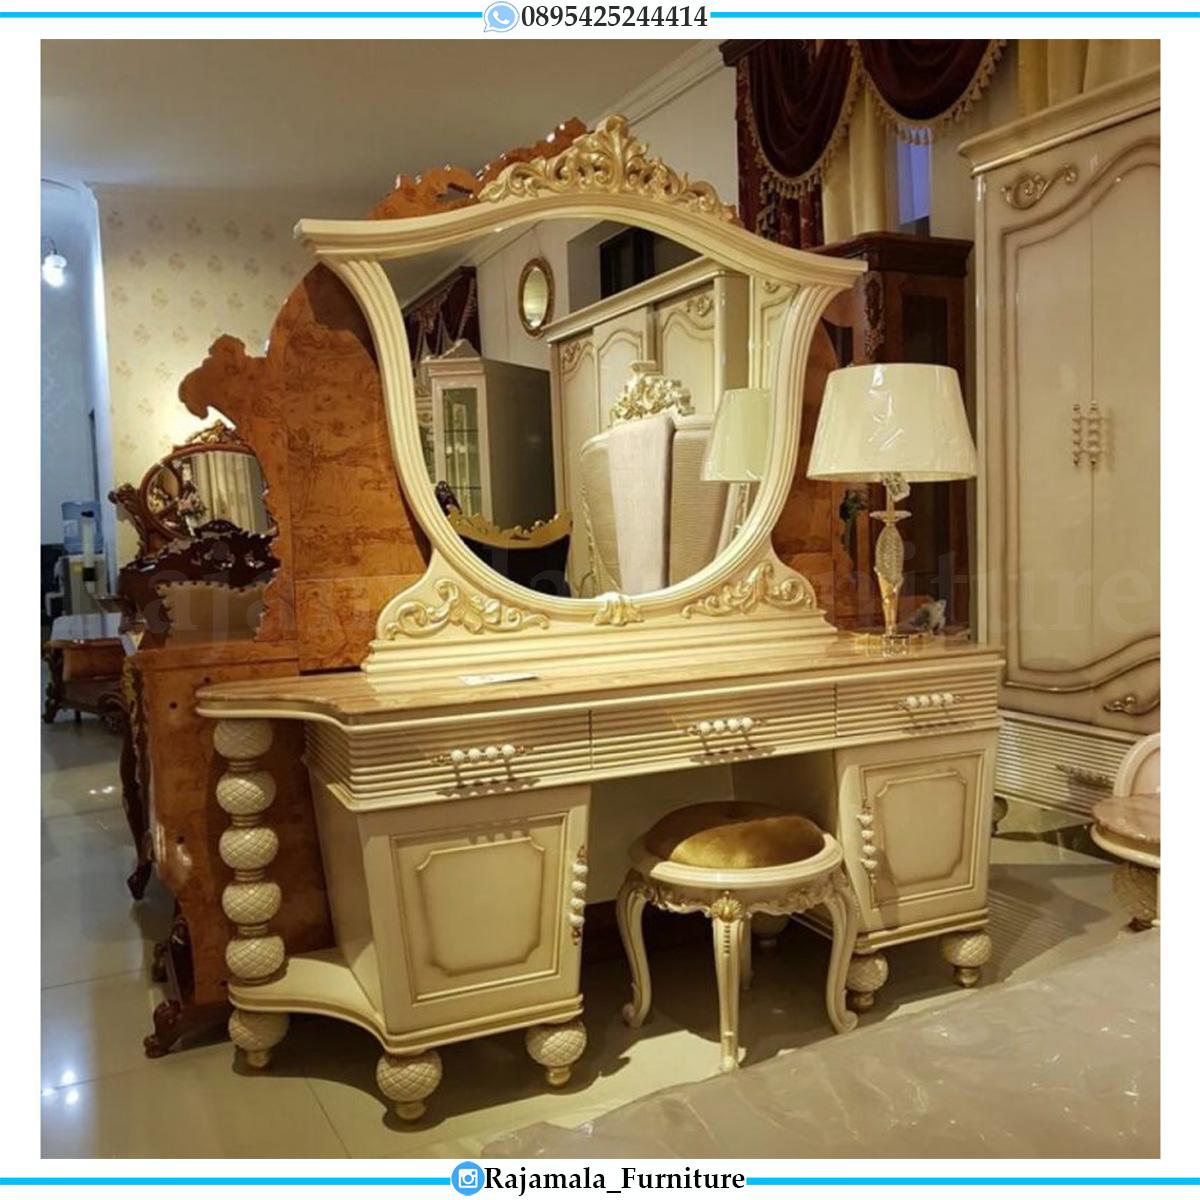 Desain Meja Rias Mewah Vanity Room Luxury Interior Inspiring RM-0550